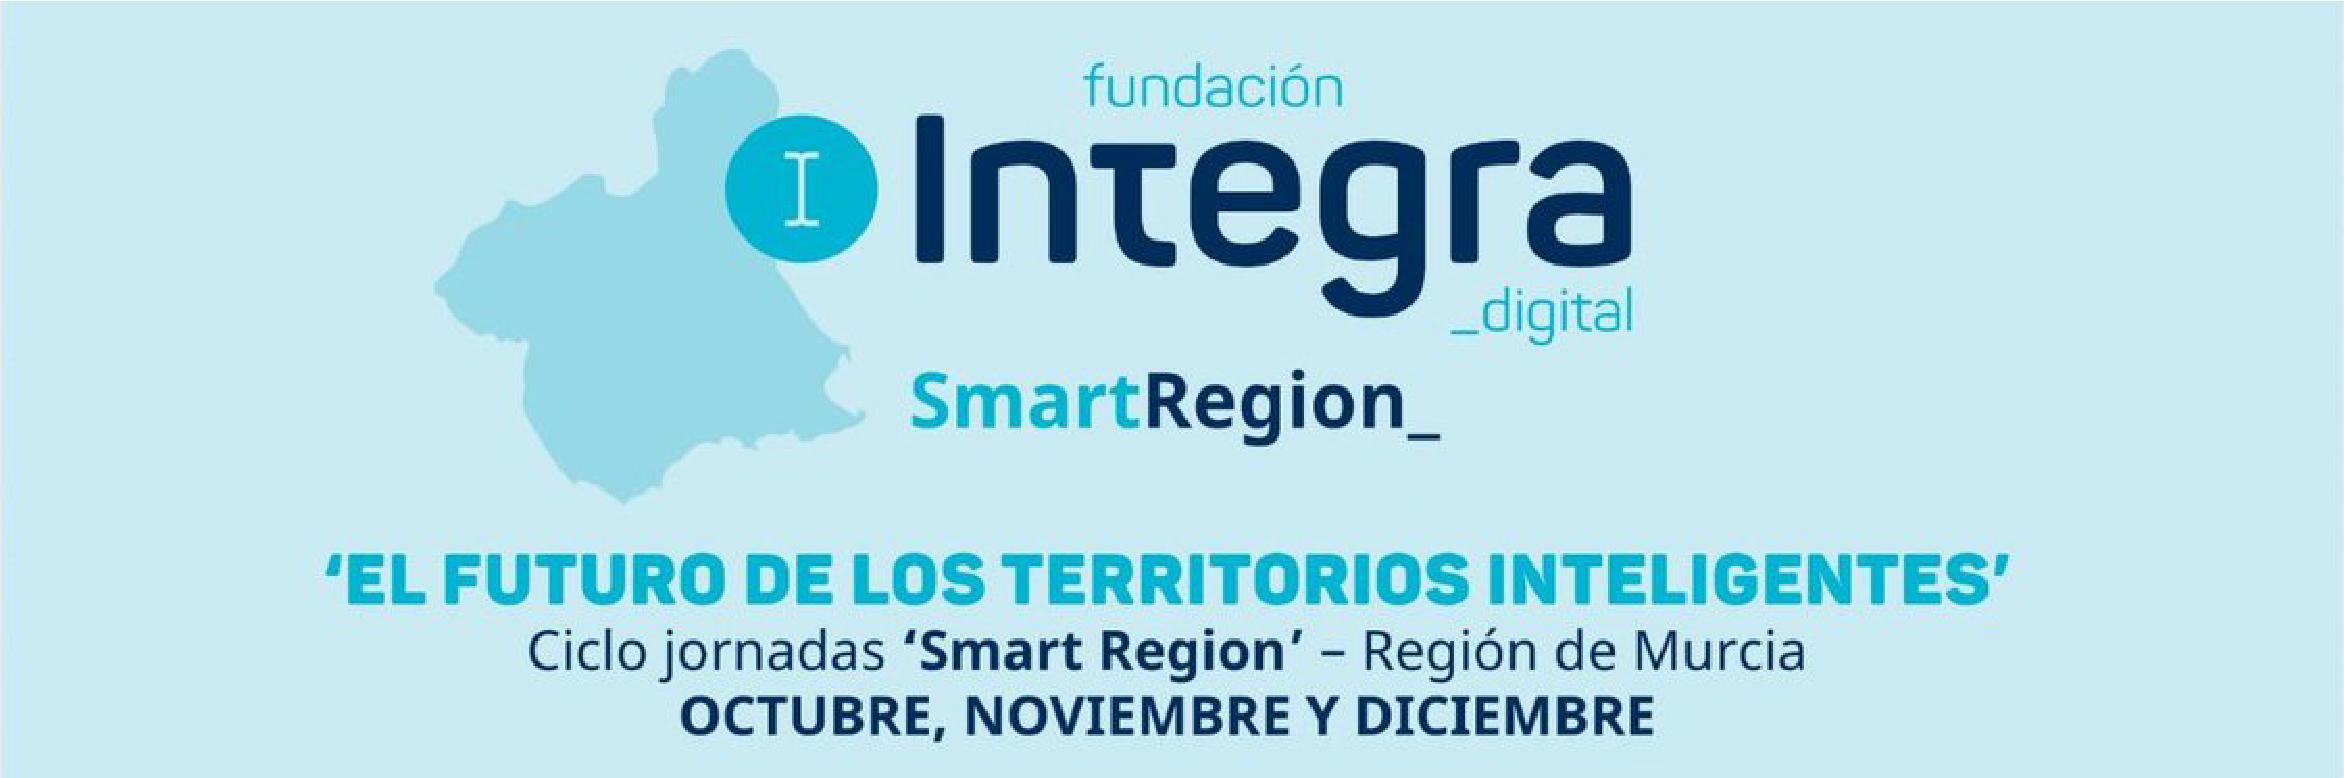 Smart Region, una iniciativa regional para las Smart Cities murcianas